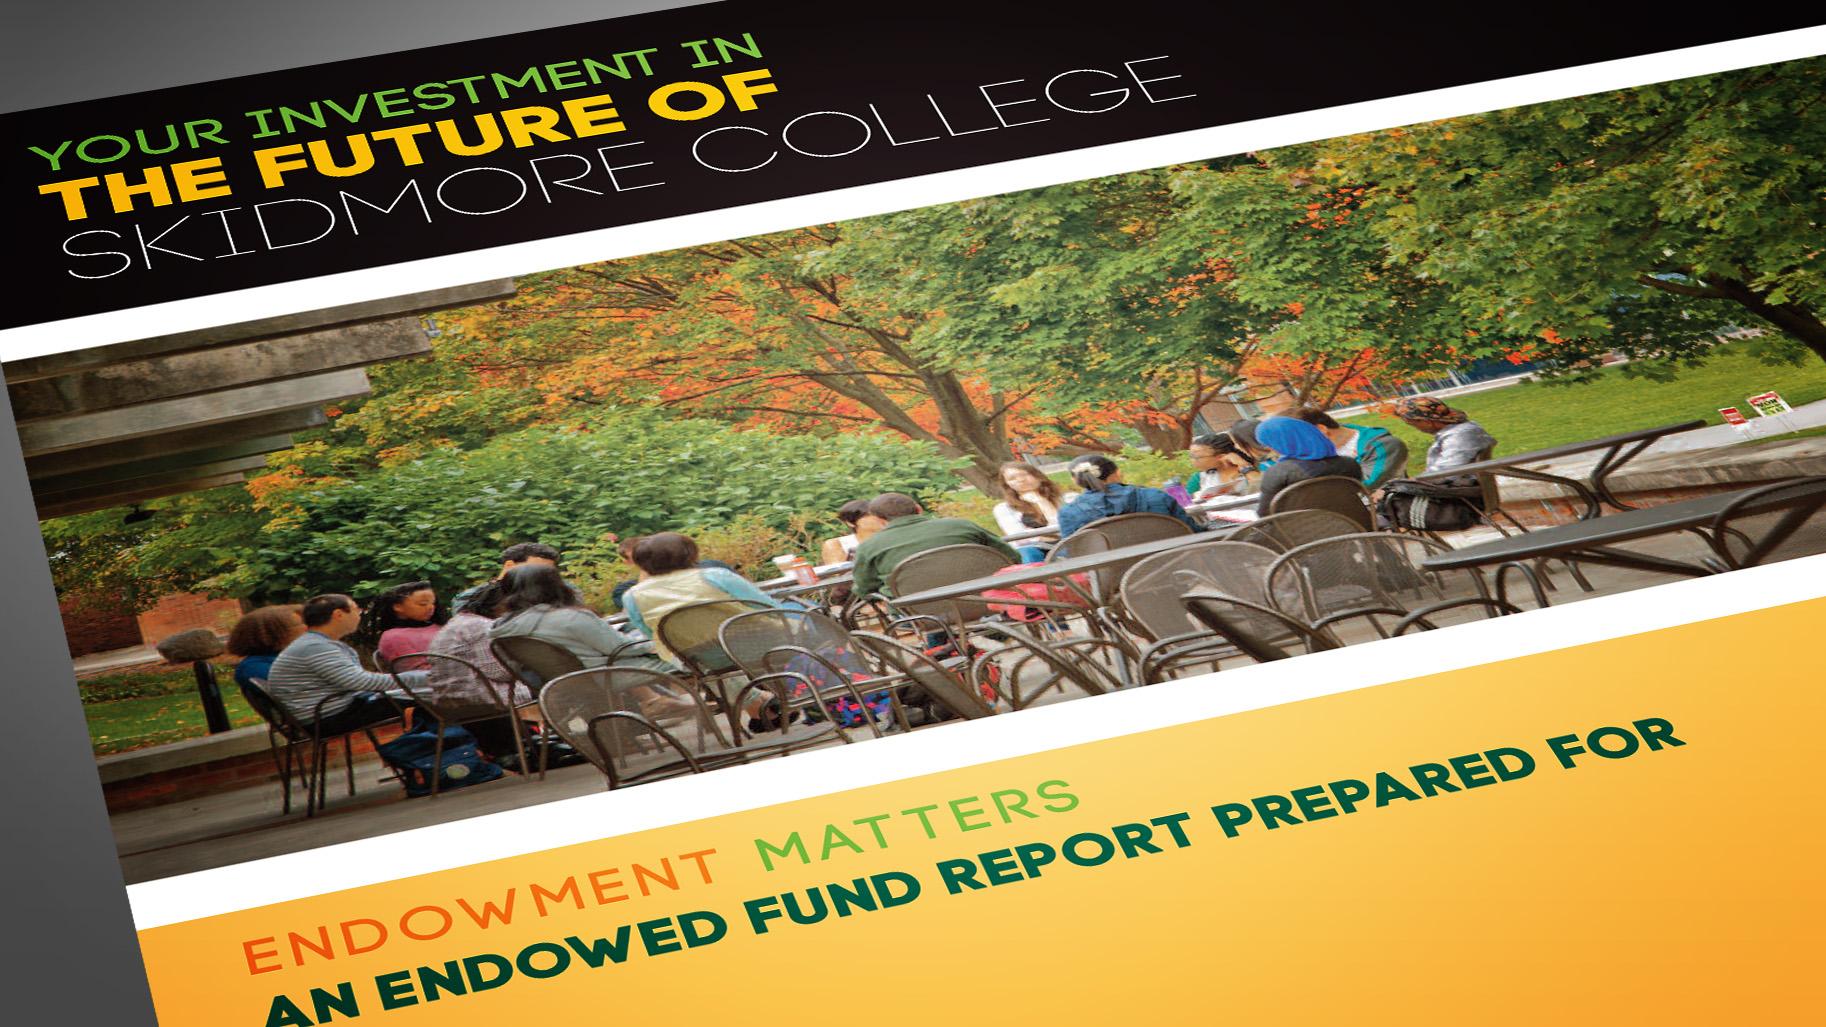 Skidmore-endowment-photo-cover.jpg